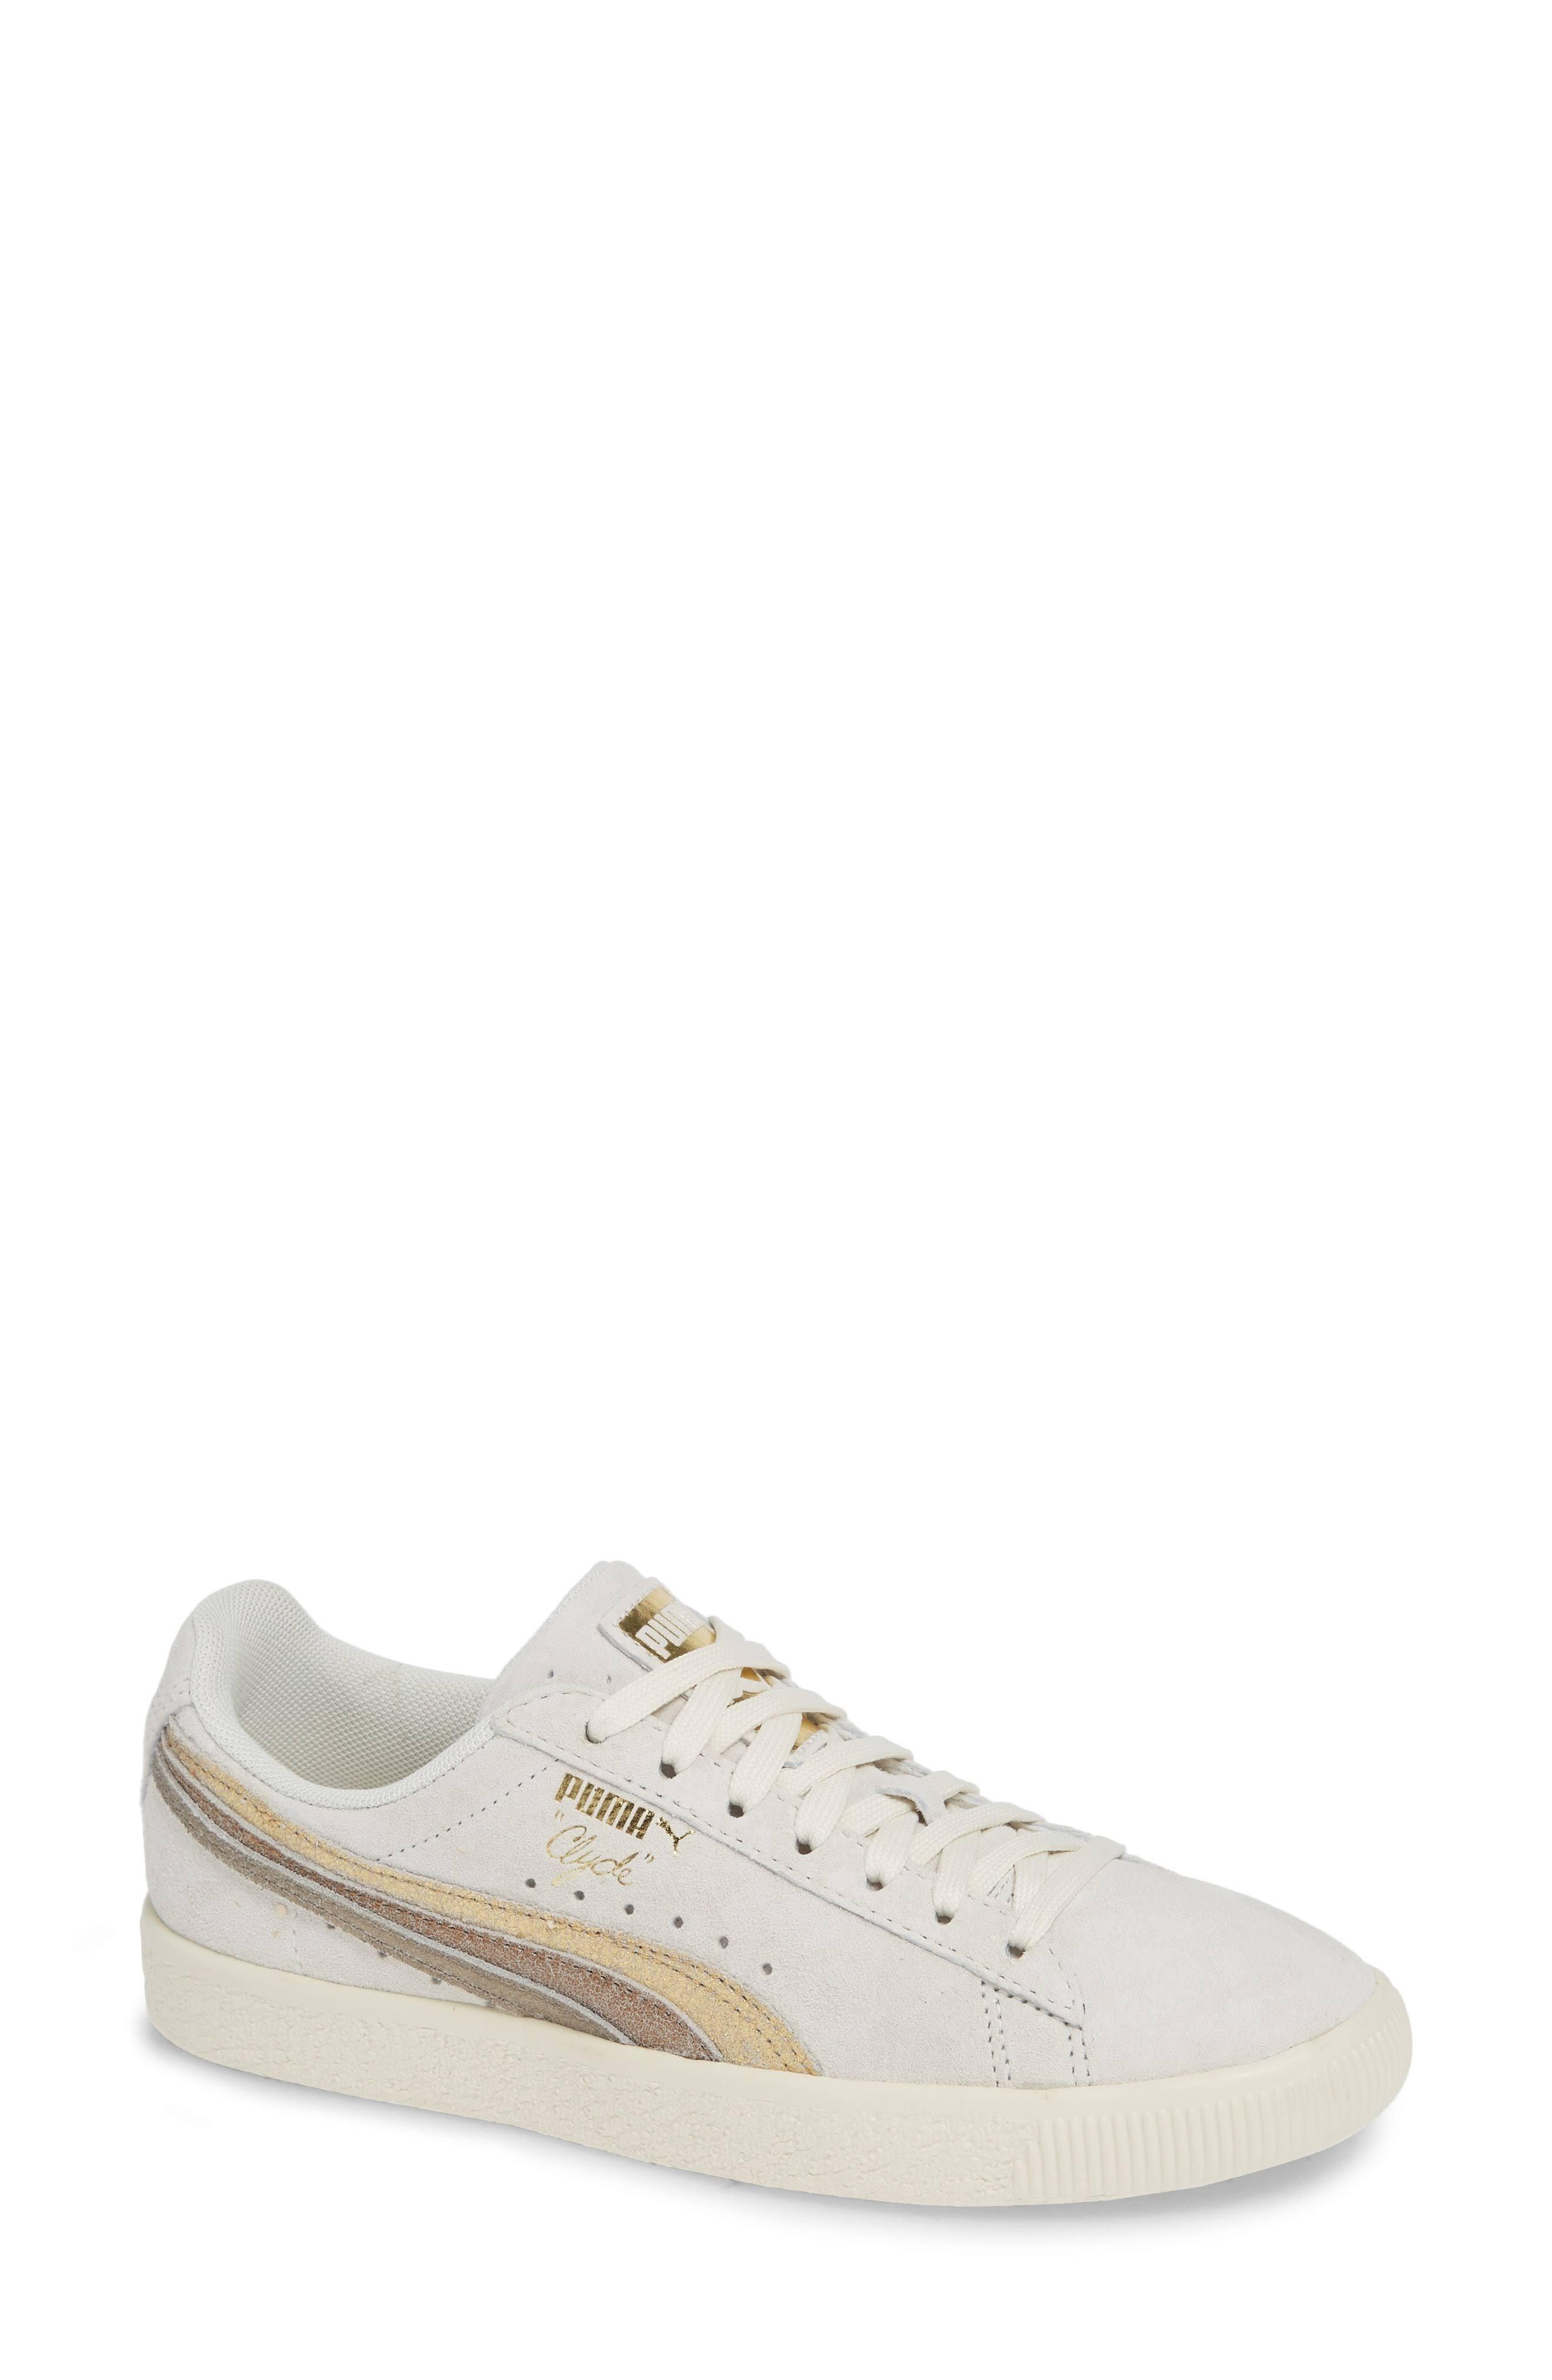 Clyde Sneakers 9 Weiß Metallic Leder Puma Größe Womens 5 IwASqP5